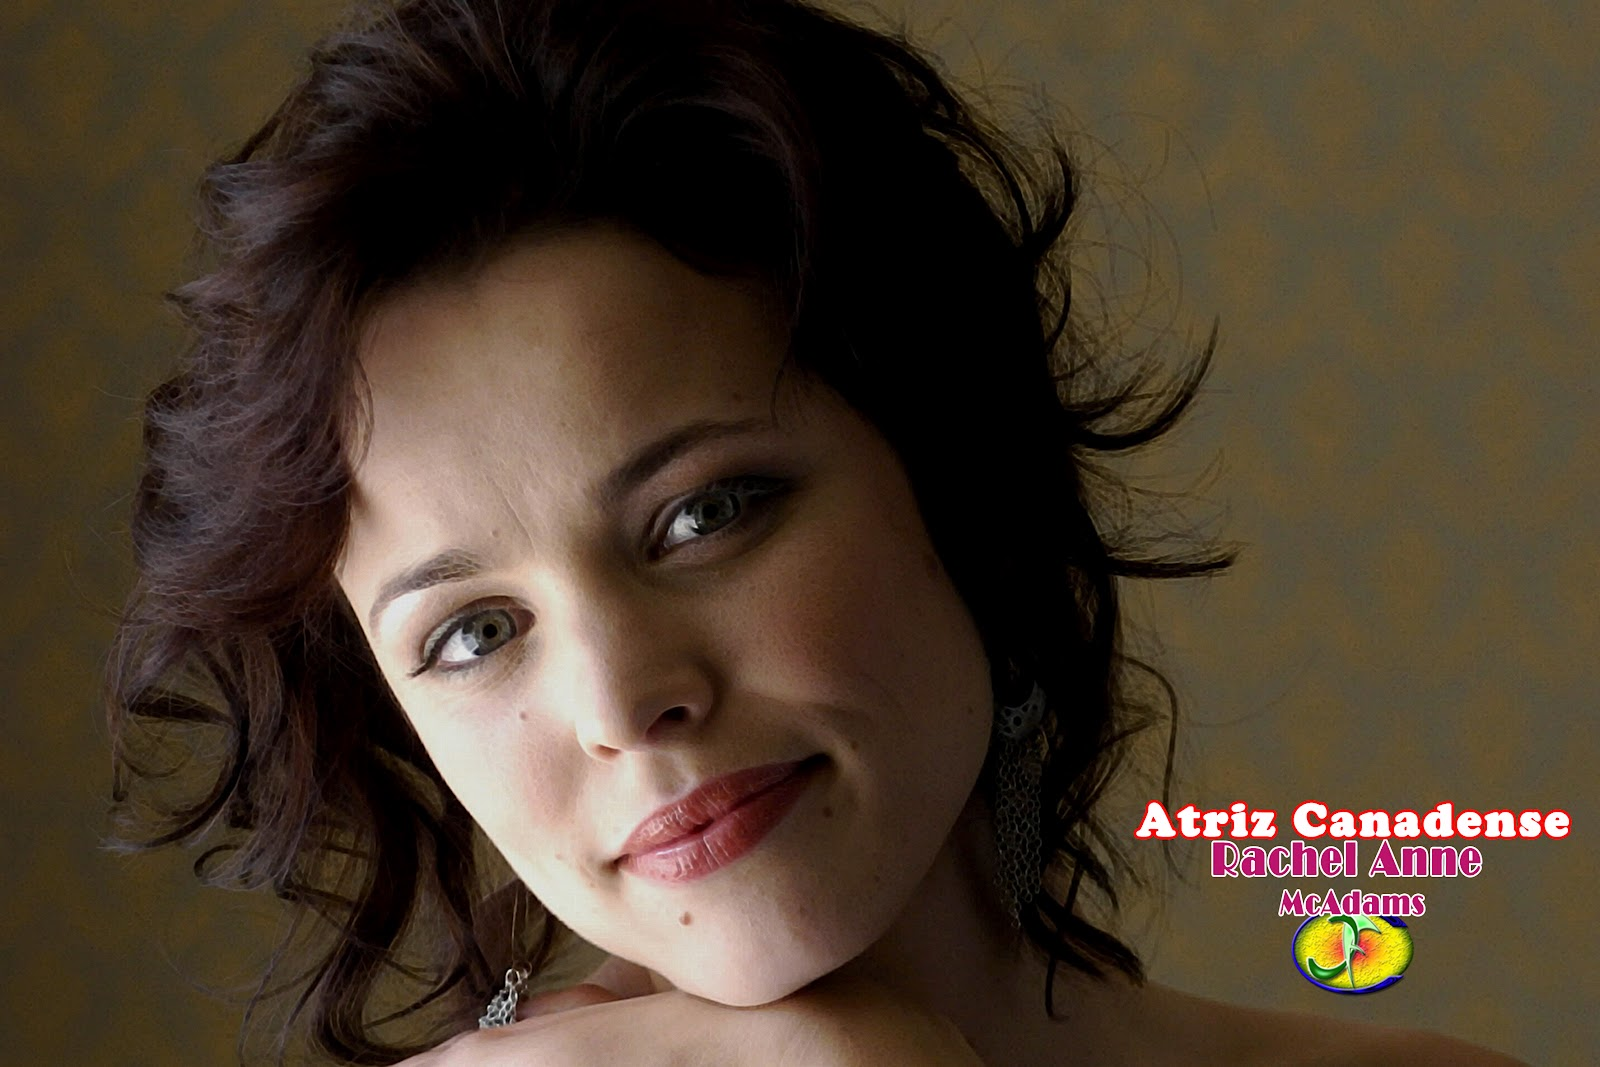 http://3.bp.blogspot.com/--UYx4t0fYmE/T-fvL5XFpsI/AAAAAAAAEKg/Q-91scGeBQw/s1600/FAT+-+Rachel+Anne+McAdams+-+Canad%C3%A1-London+-+781117+-+33+anos+-+02.jpg